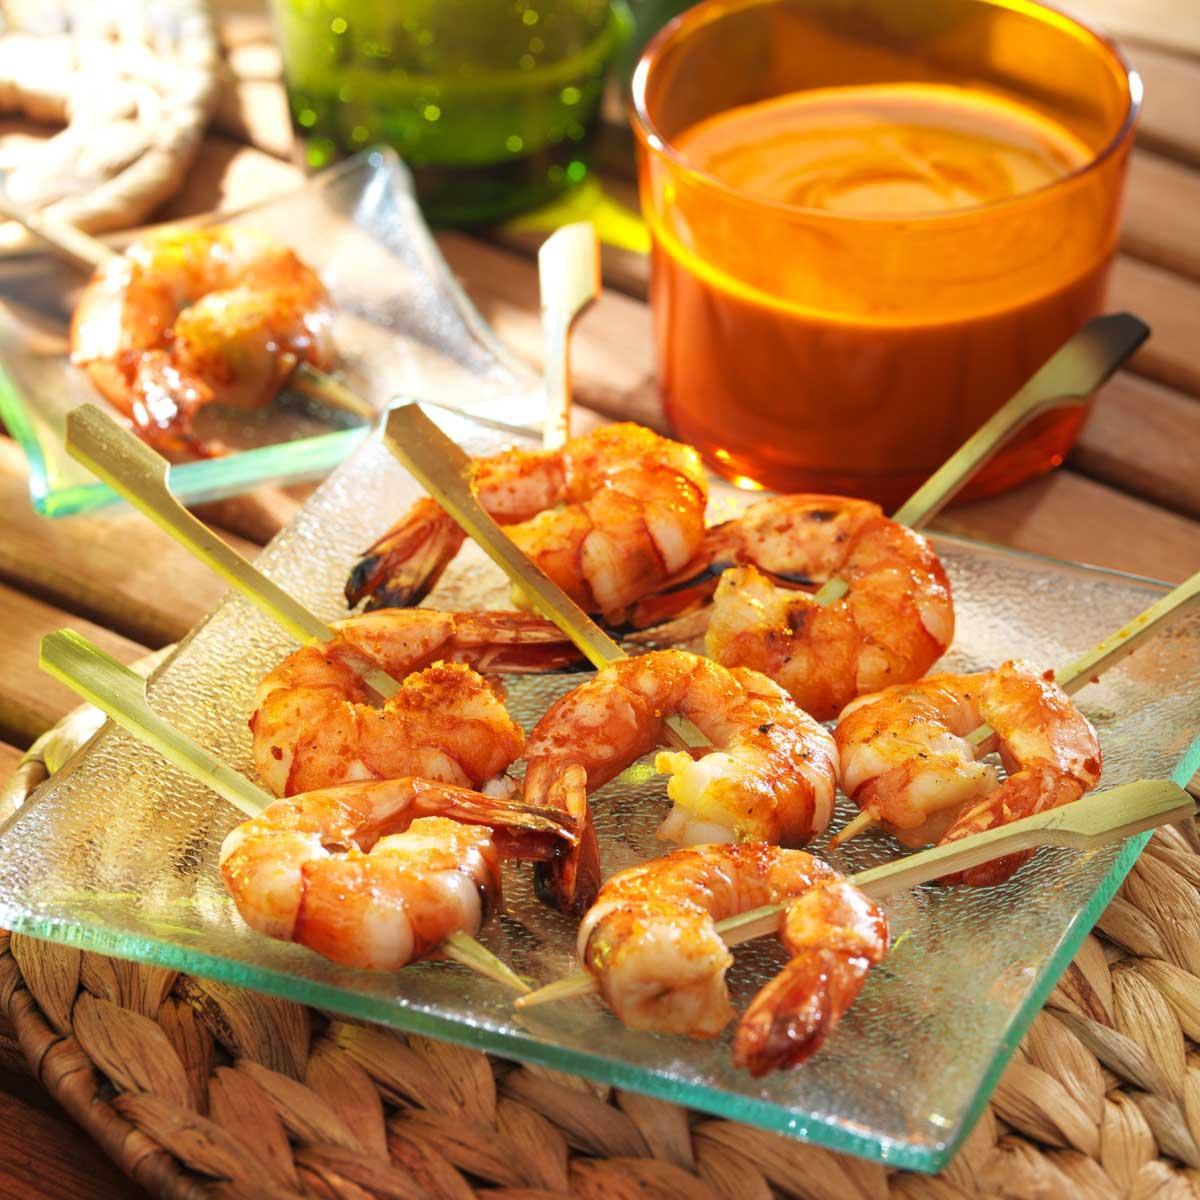 Recette crevettes sauce cacahu te cuisine madame figaro - Recette de cuisine antillaise guadeloupe ...